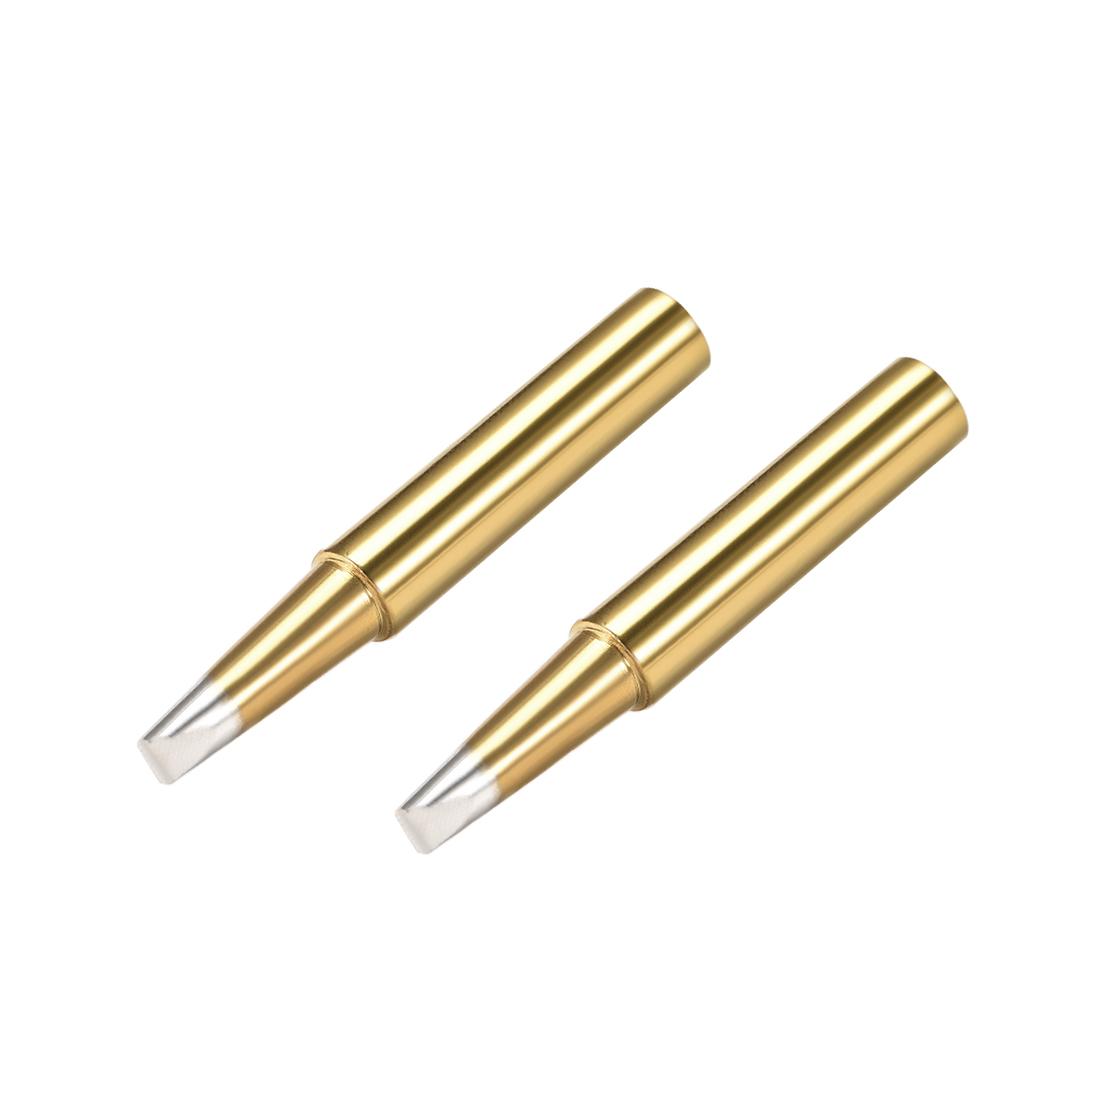 Soldering Iron Tip Replacement 3.2mm Point Width Solder Tip 3.2D Golden 2pcs